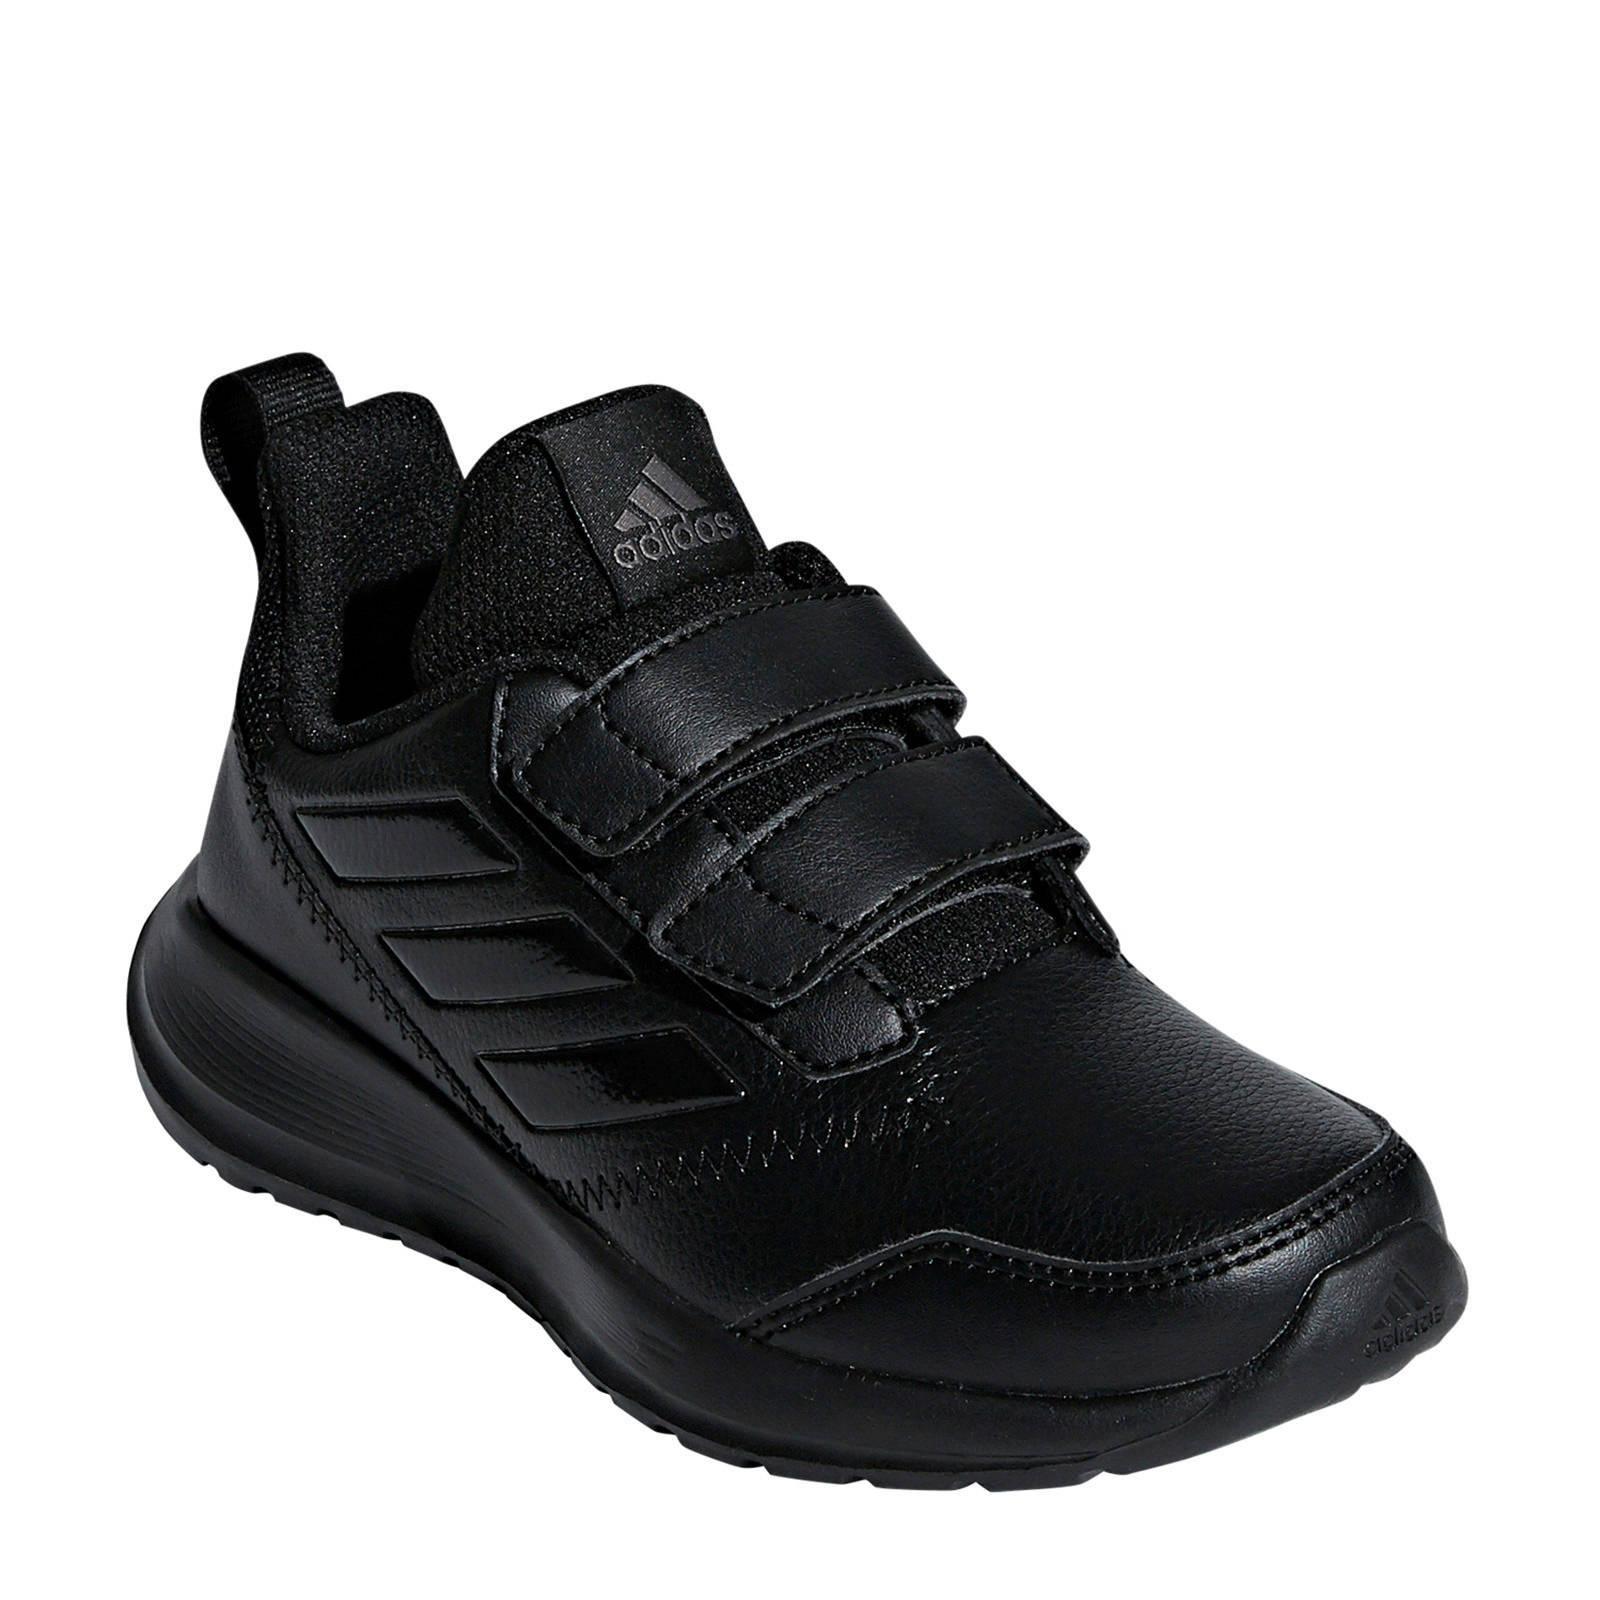 adidas Performance AltaRun CF K sportschoenen zwart kids